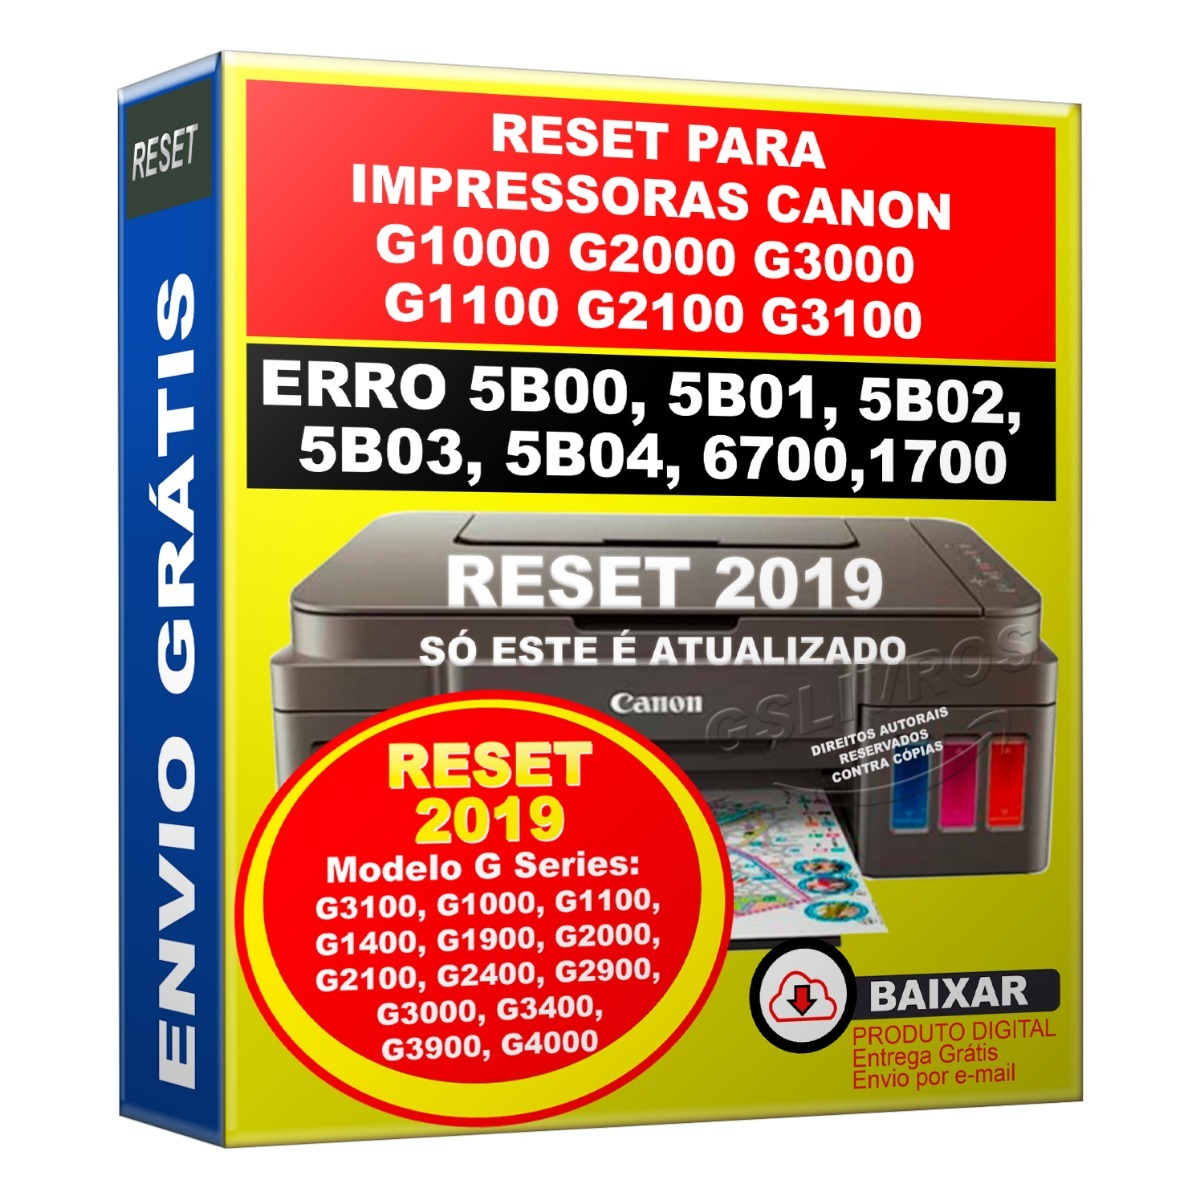 Canon ix6560 error code